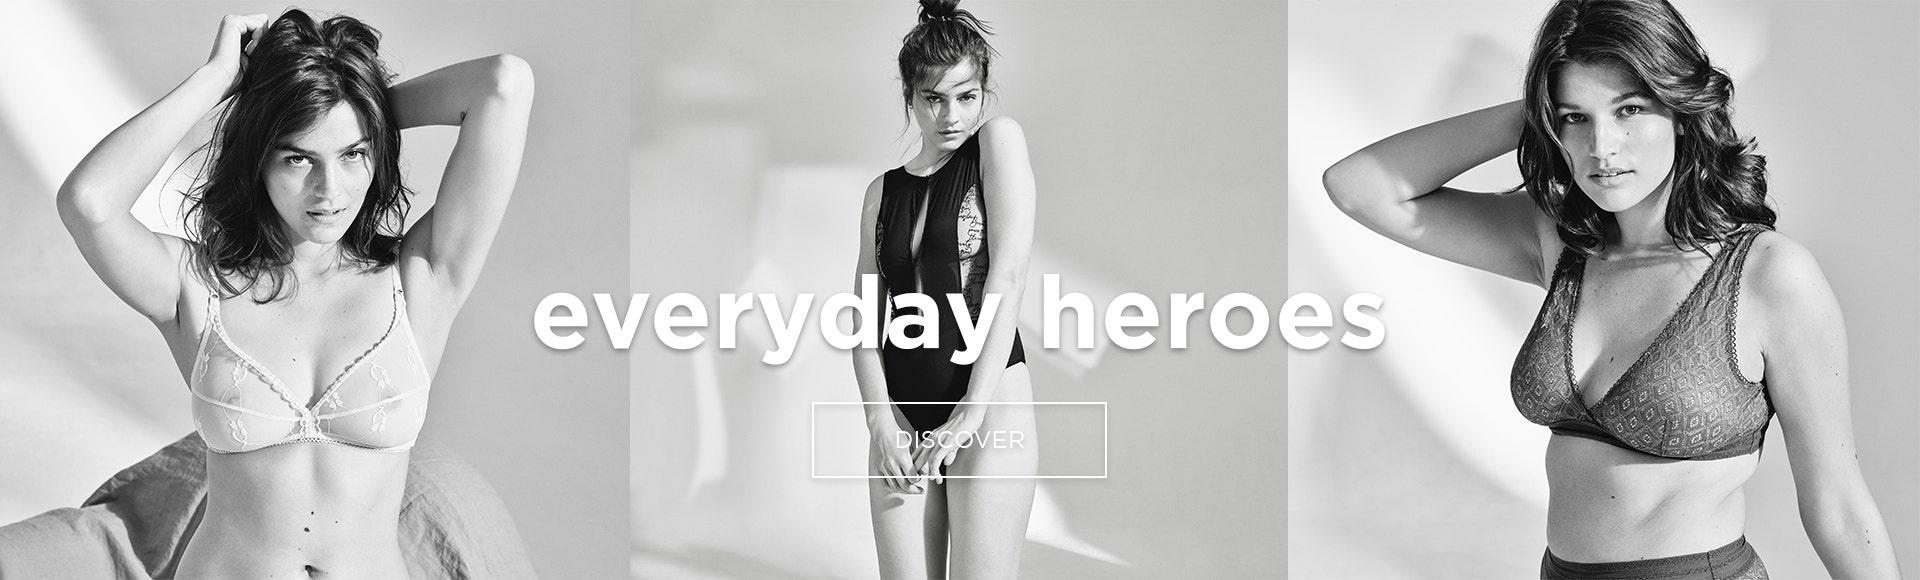 everyday heroes | Simone Pérèle